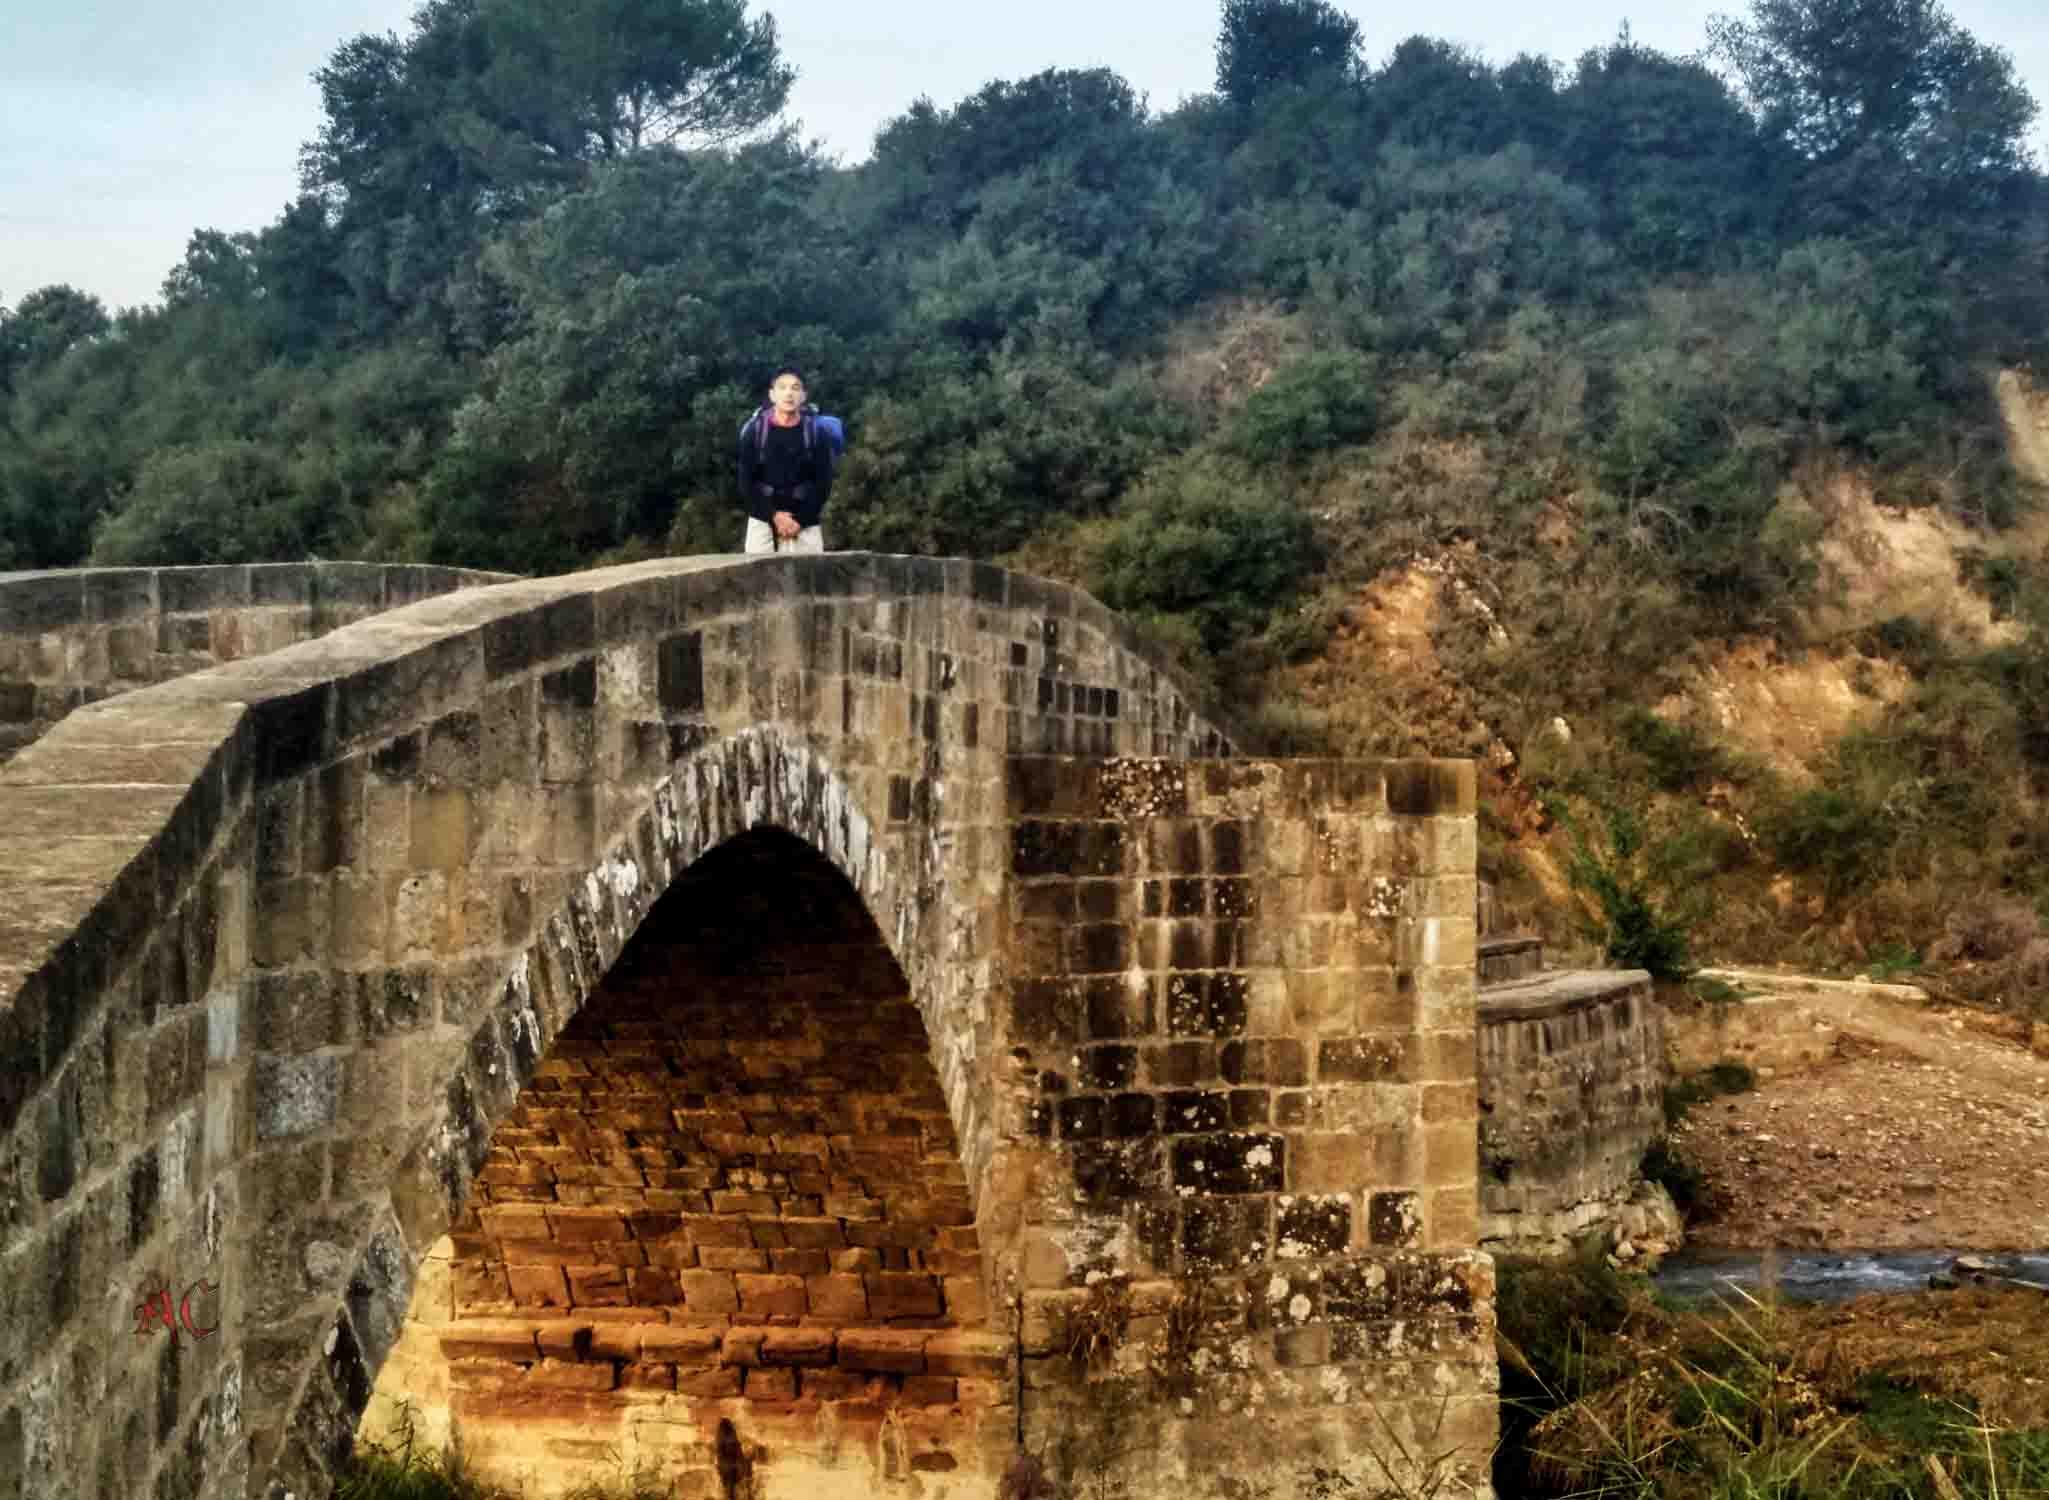 Camino de Santiago, Camino Frances. Zirauki Loas Arcos